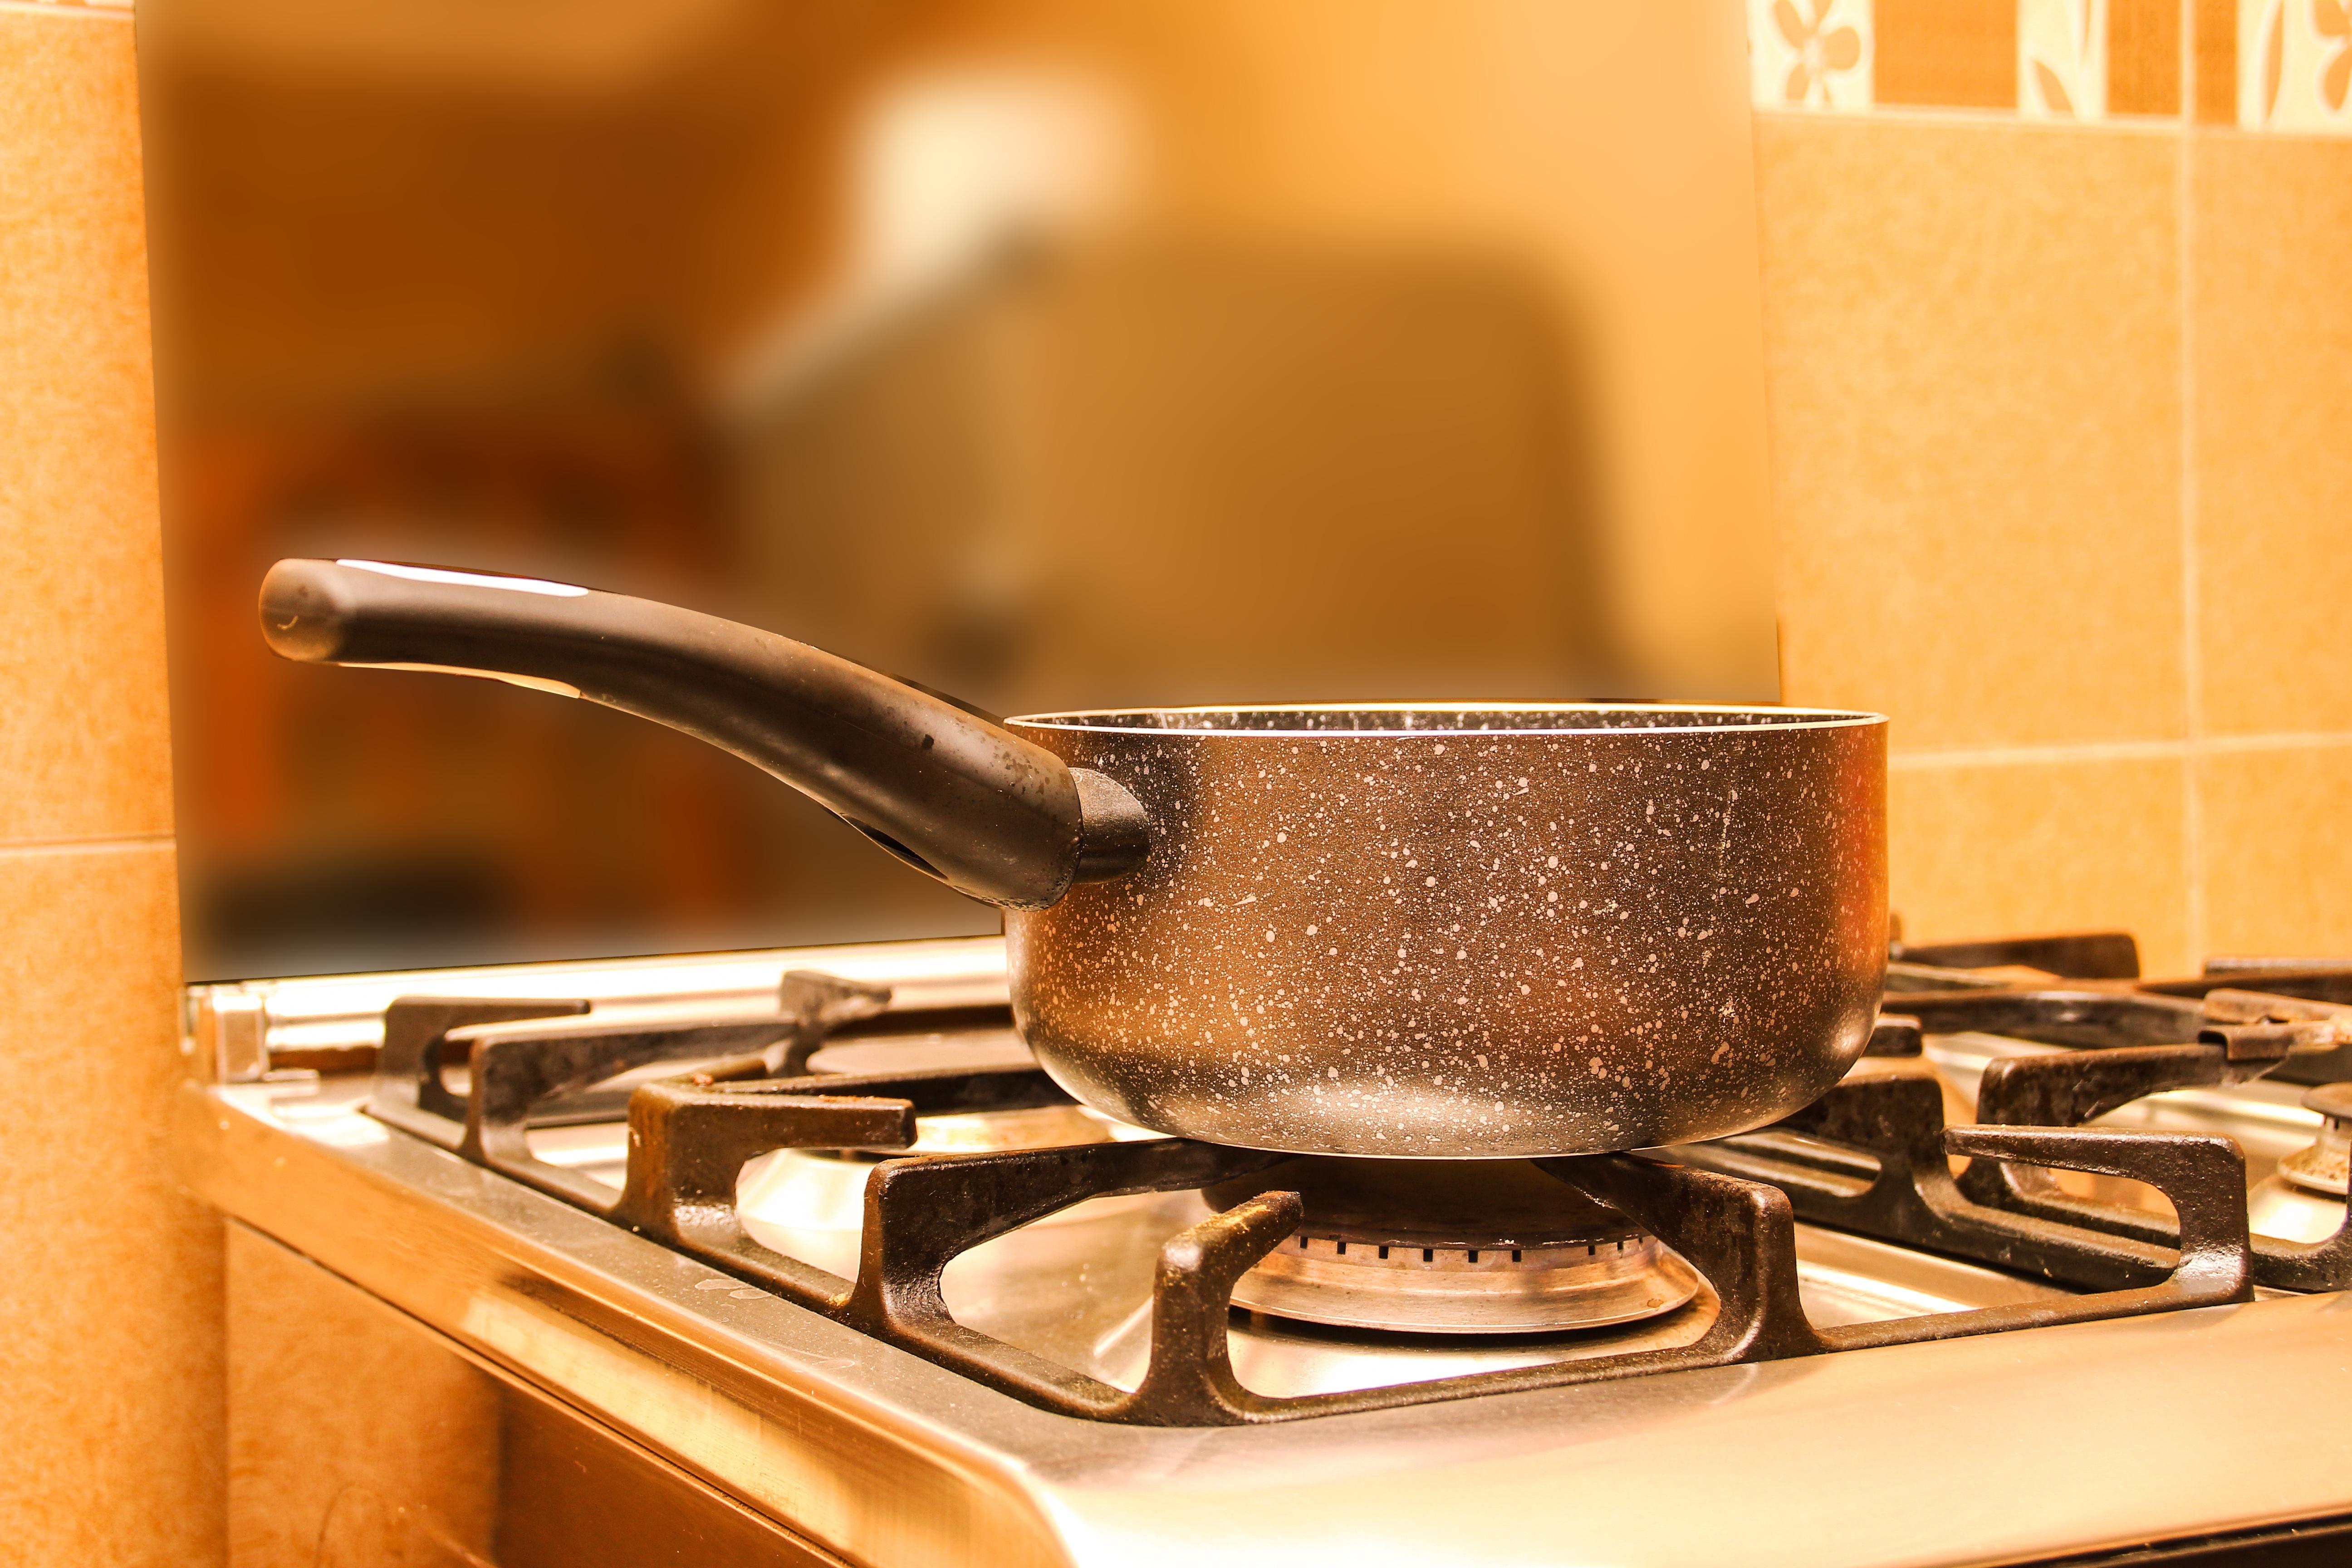 Fotos Gratis Plato Comida Cocina Fuego Beber Pan